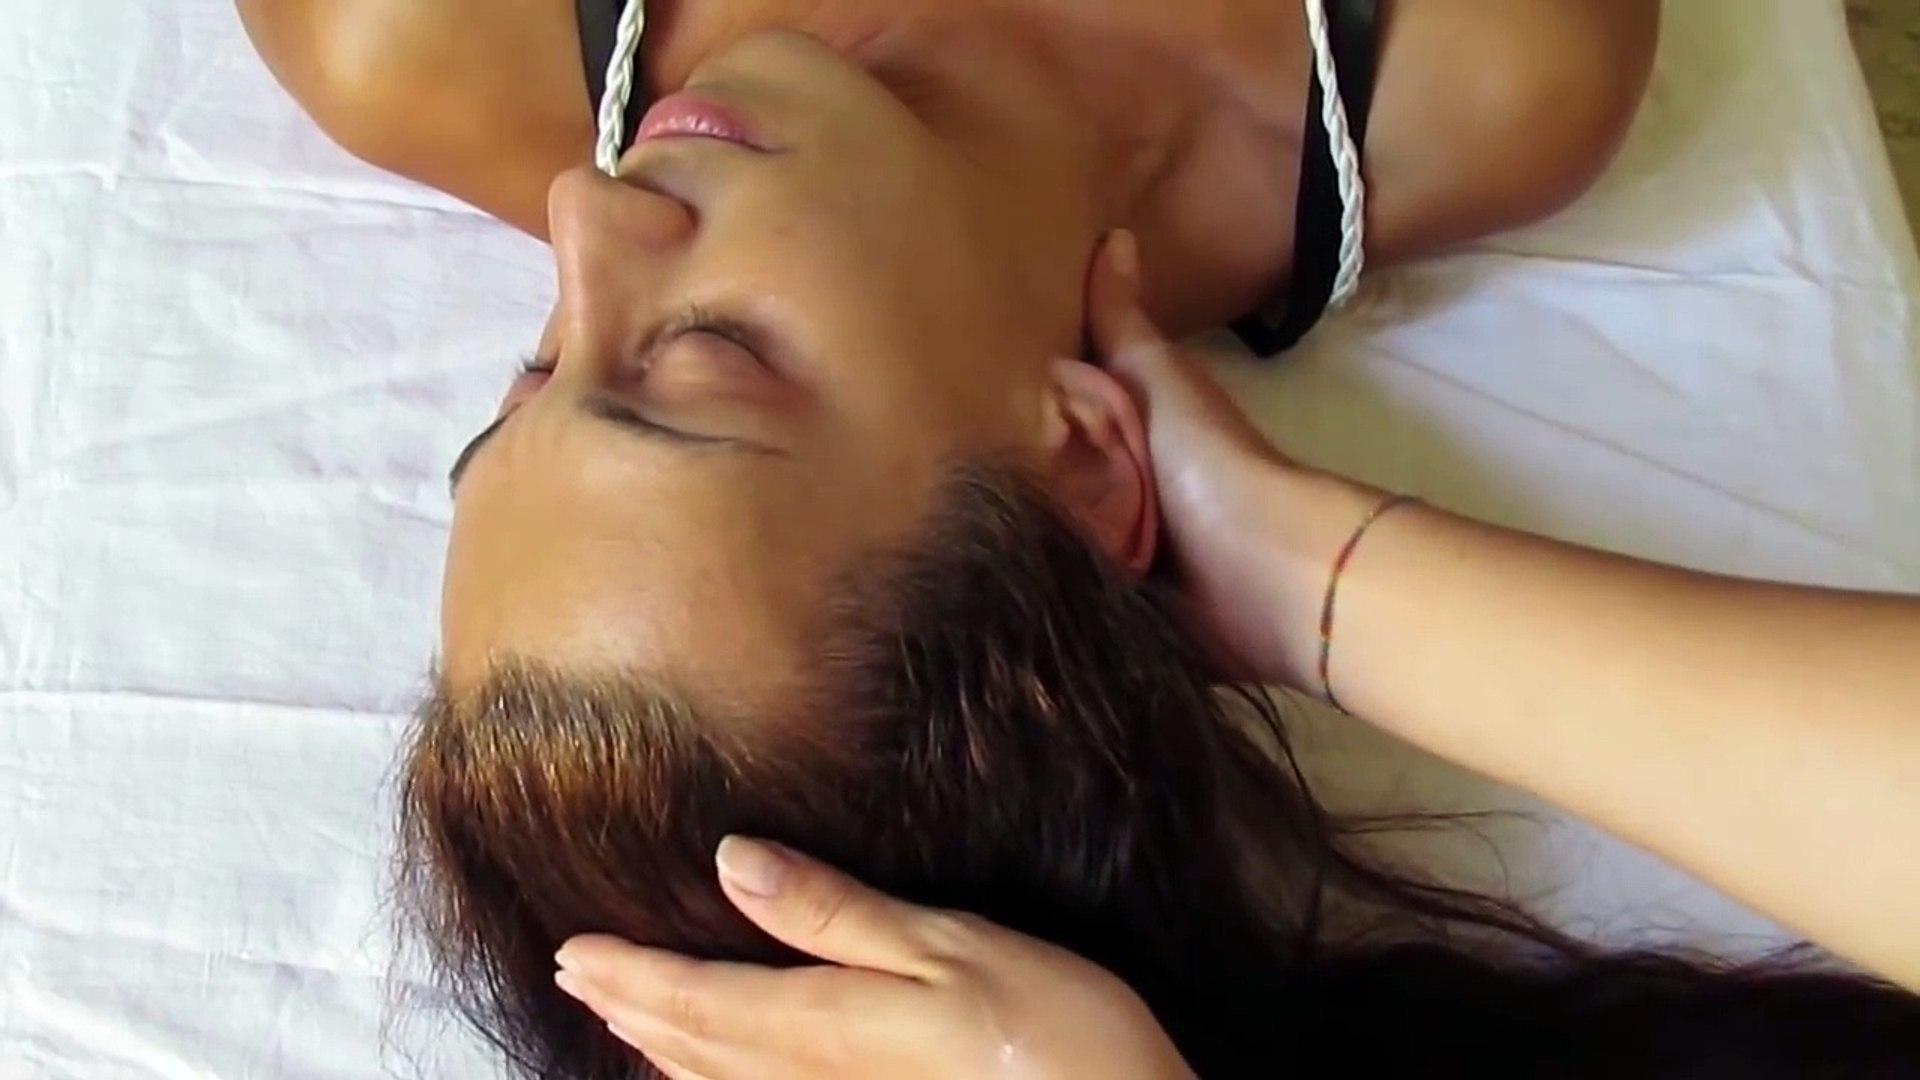 Relaxing Face Massage (No Music) ASMR